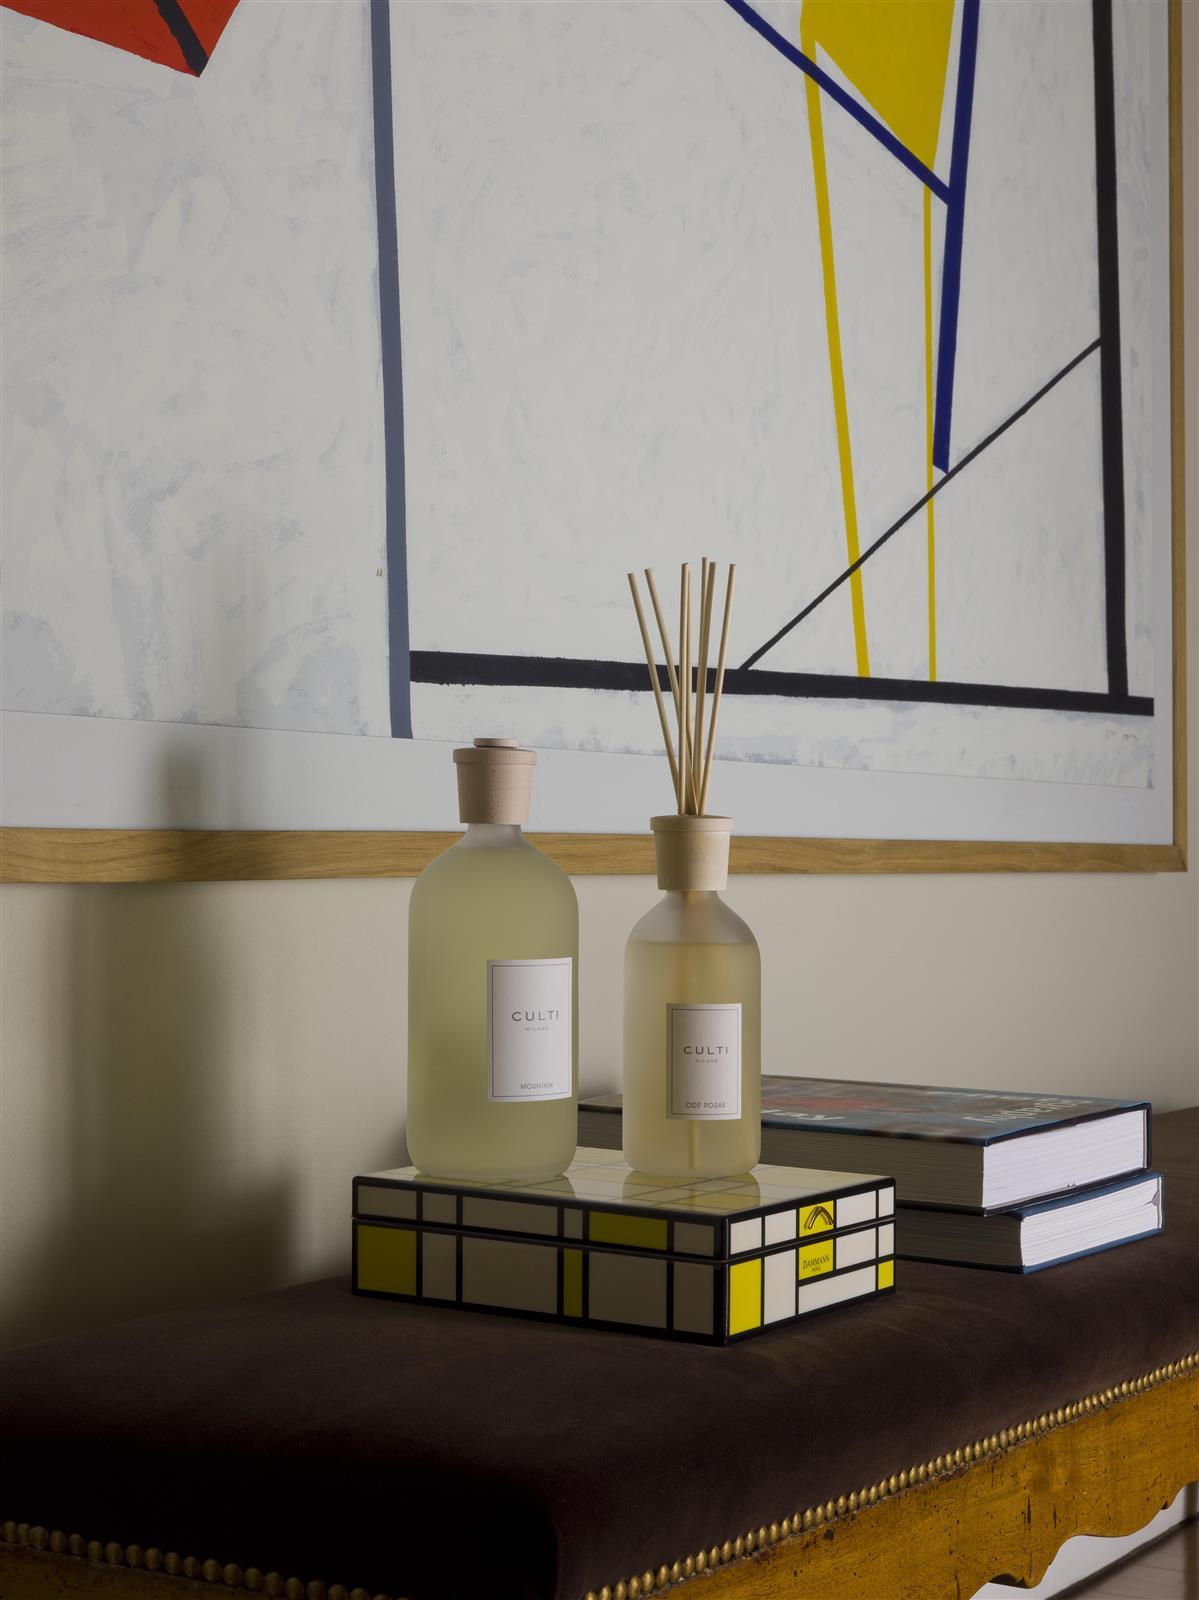 culti raumduft stile classic diffuser terra 1l eur 105 00. Black Bedroom Furniture Sets. Home Design Ideas